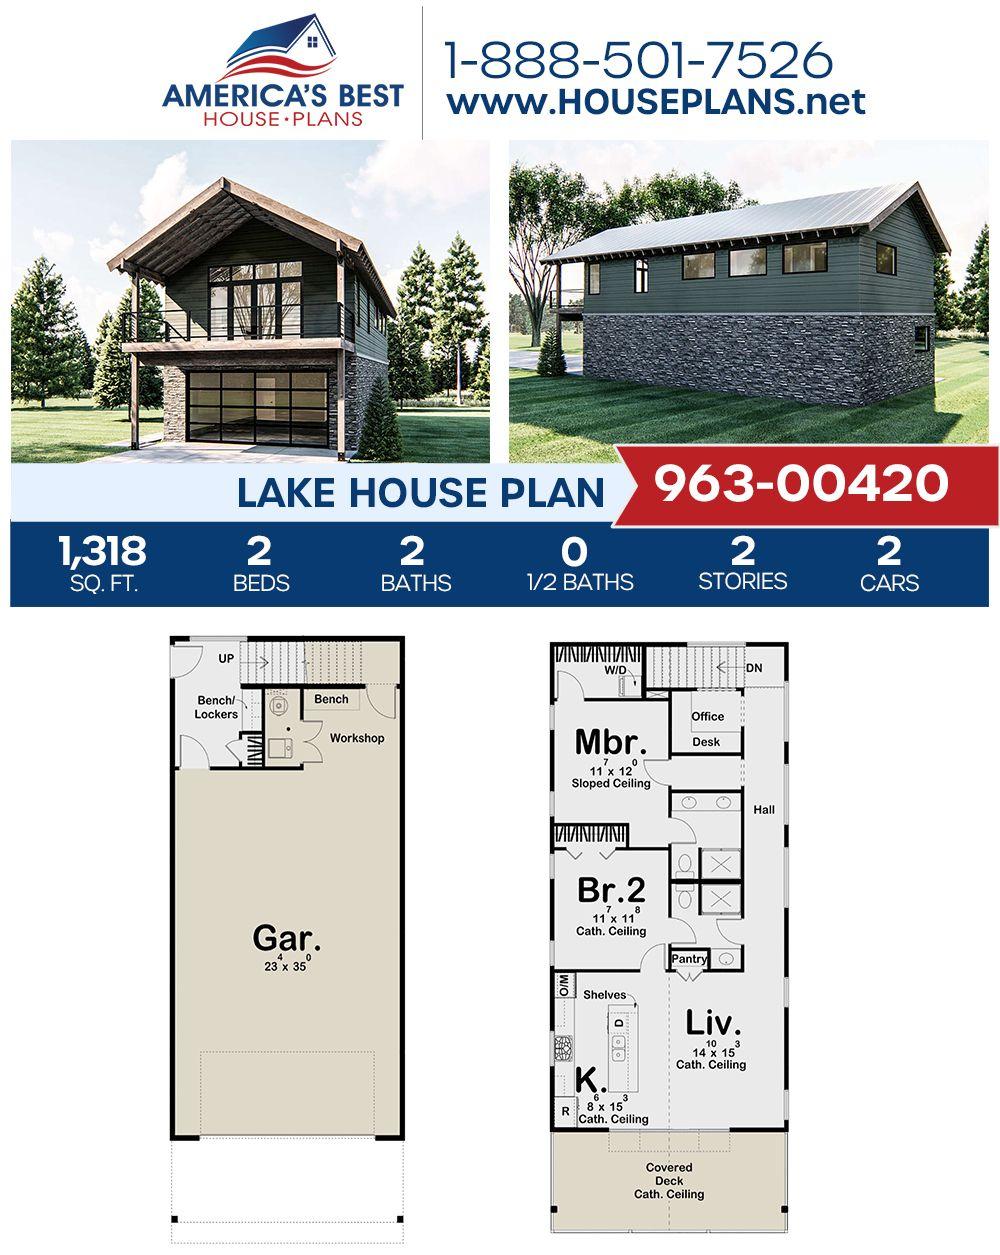 House Plan 963 00420 Lake Front Plan 1 318 Square Feet 2 Bedrooms 2 Bathrooms Lake House Plans House Plans Log Cabin House Plans